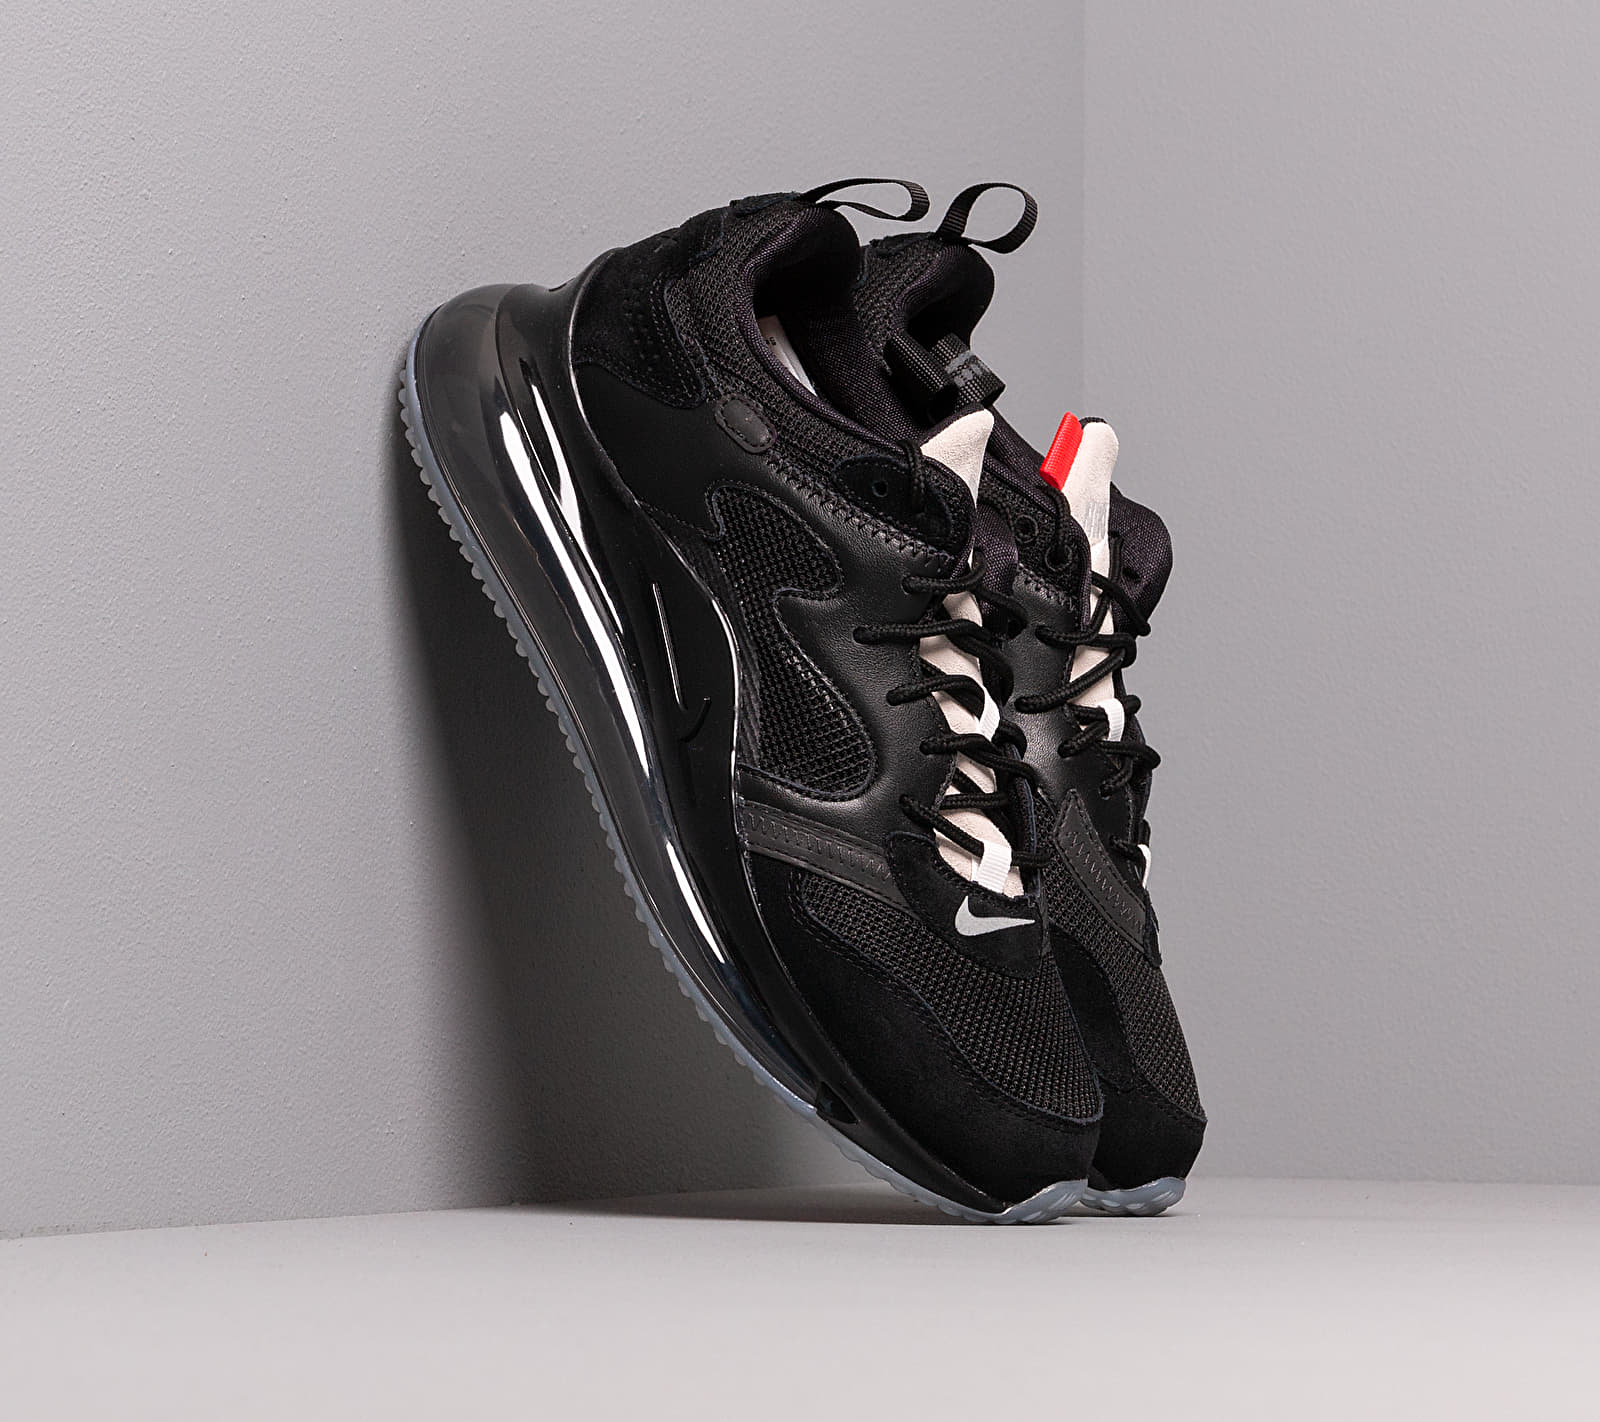 Nike Air Max 720 / Obj Black/ Summit White-Red Orbit